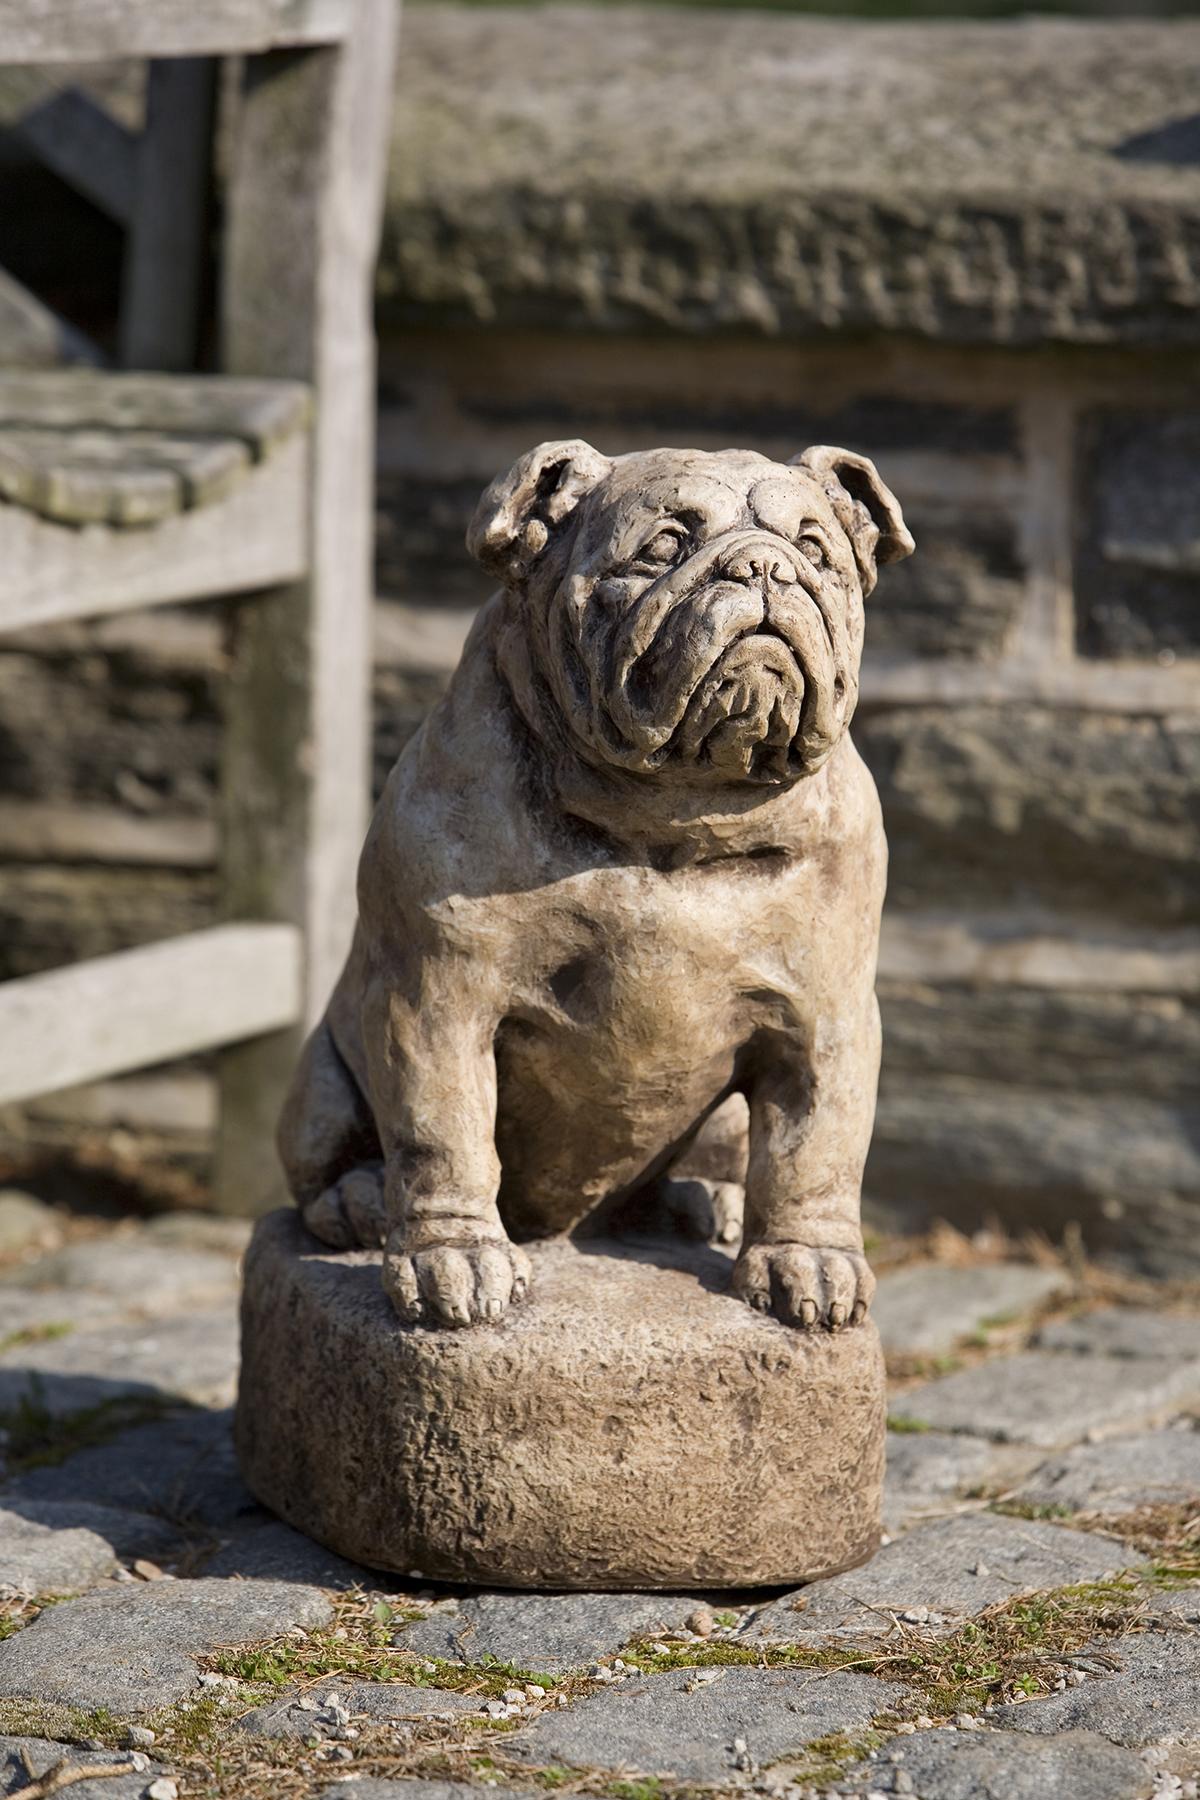 Petey the Bulldog